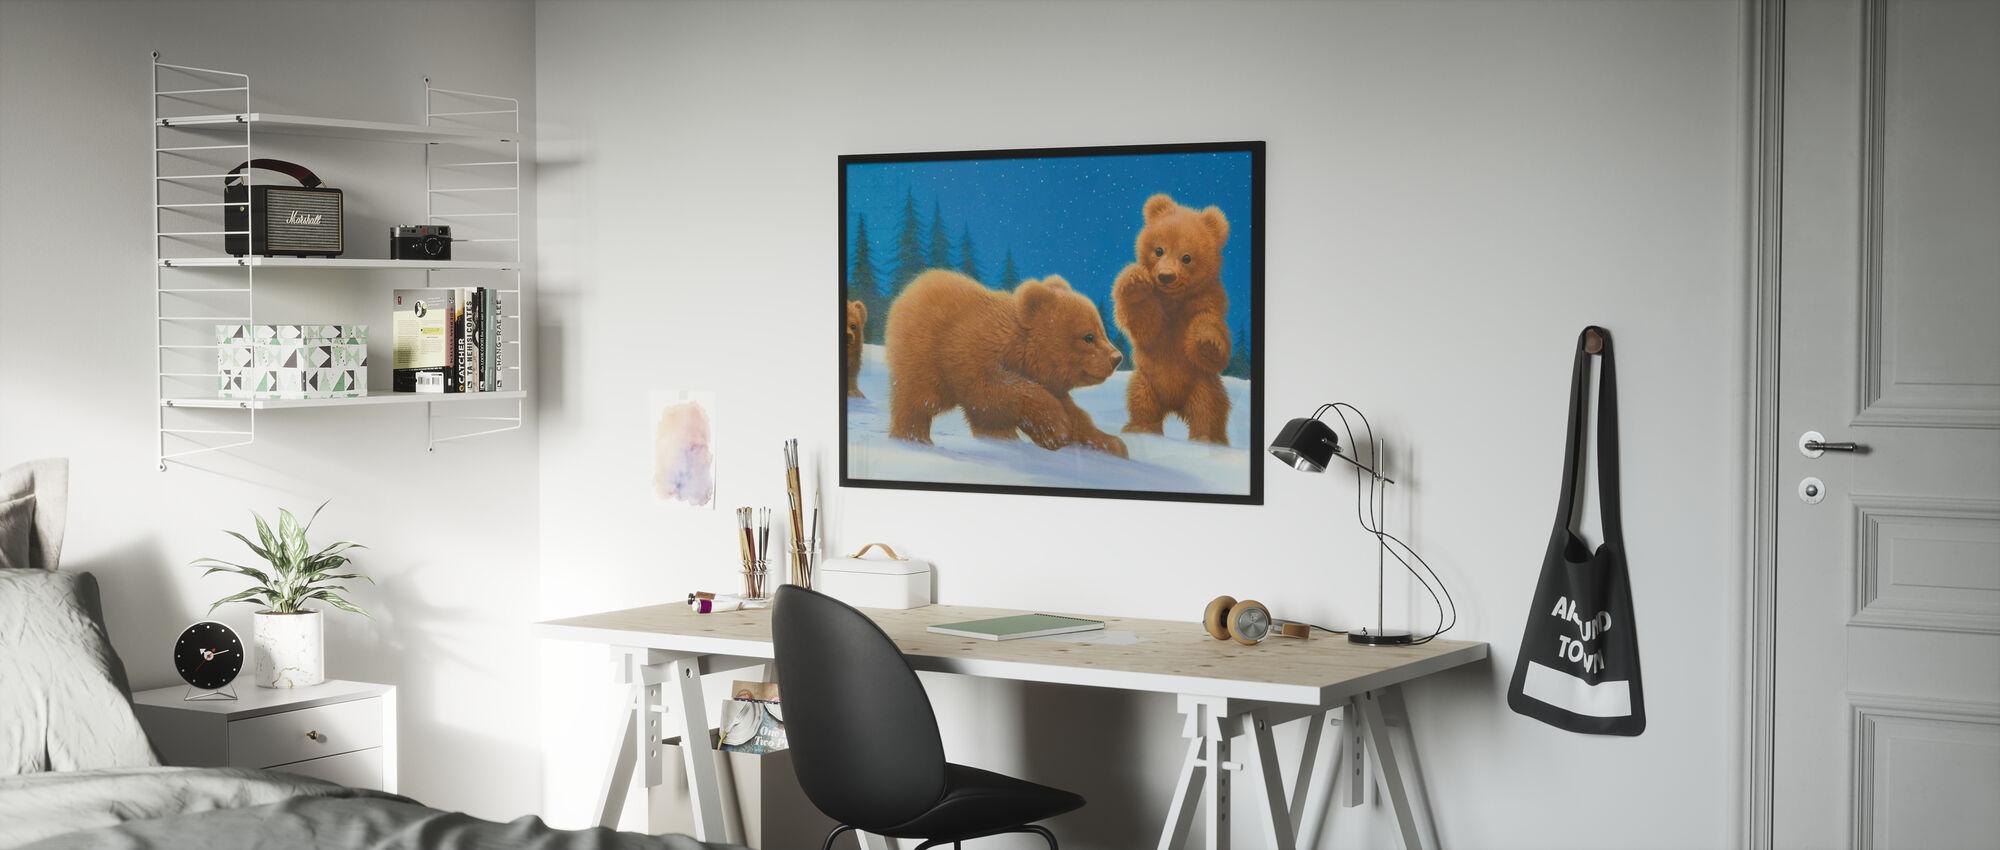 Follow the Bear - Poster - Kids Room